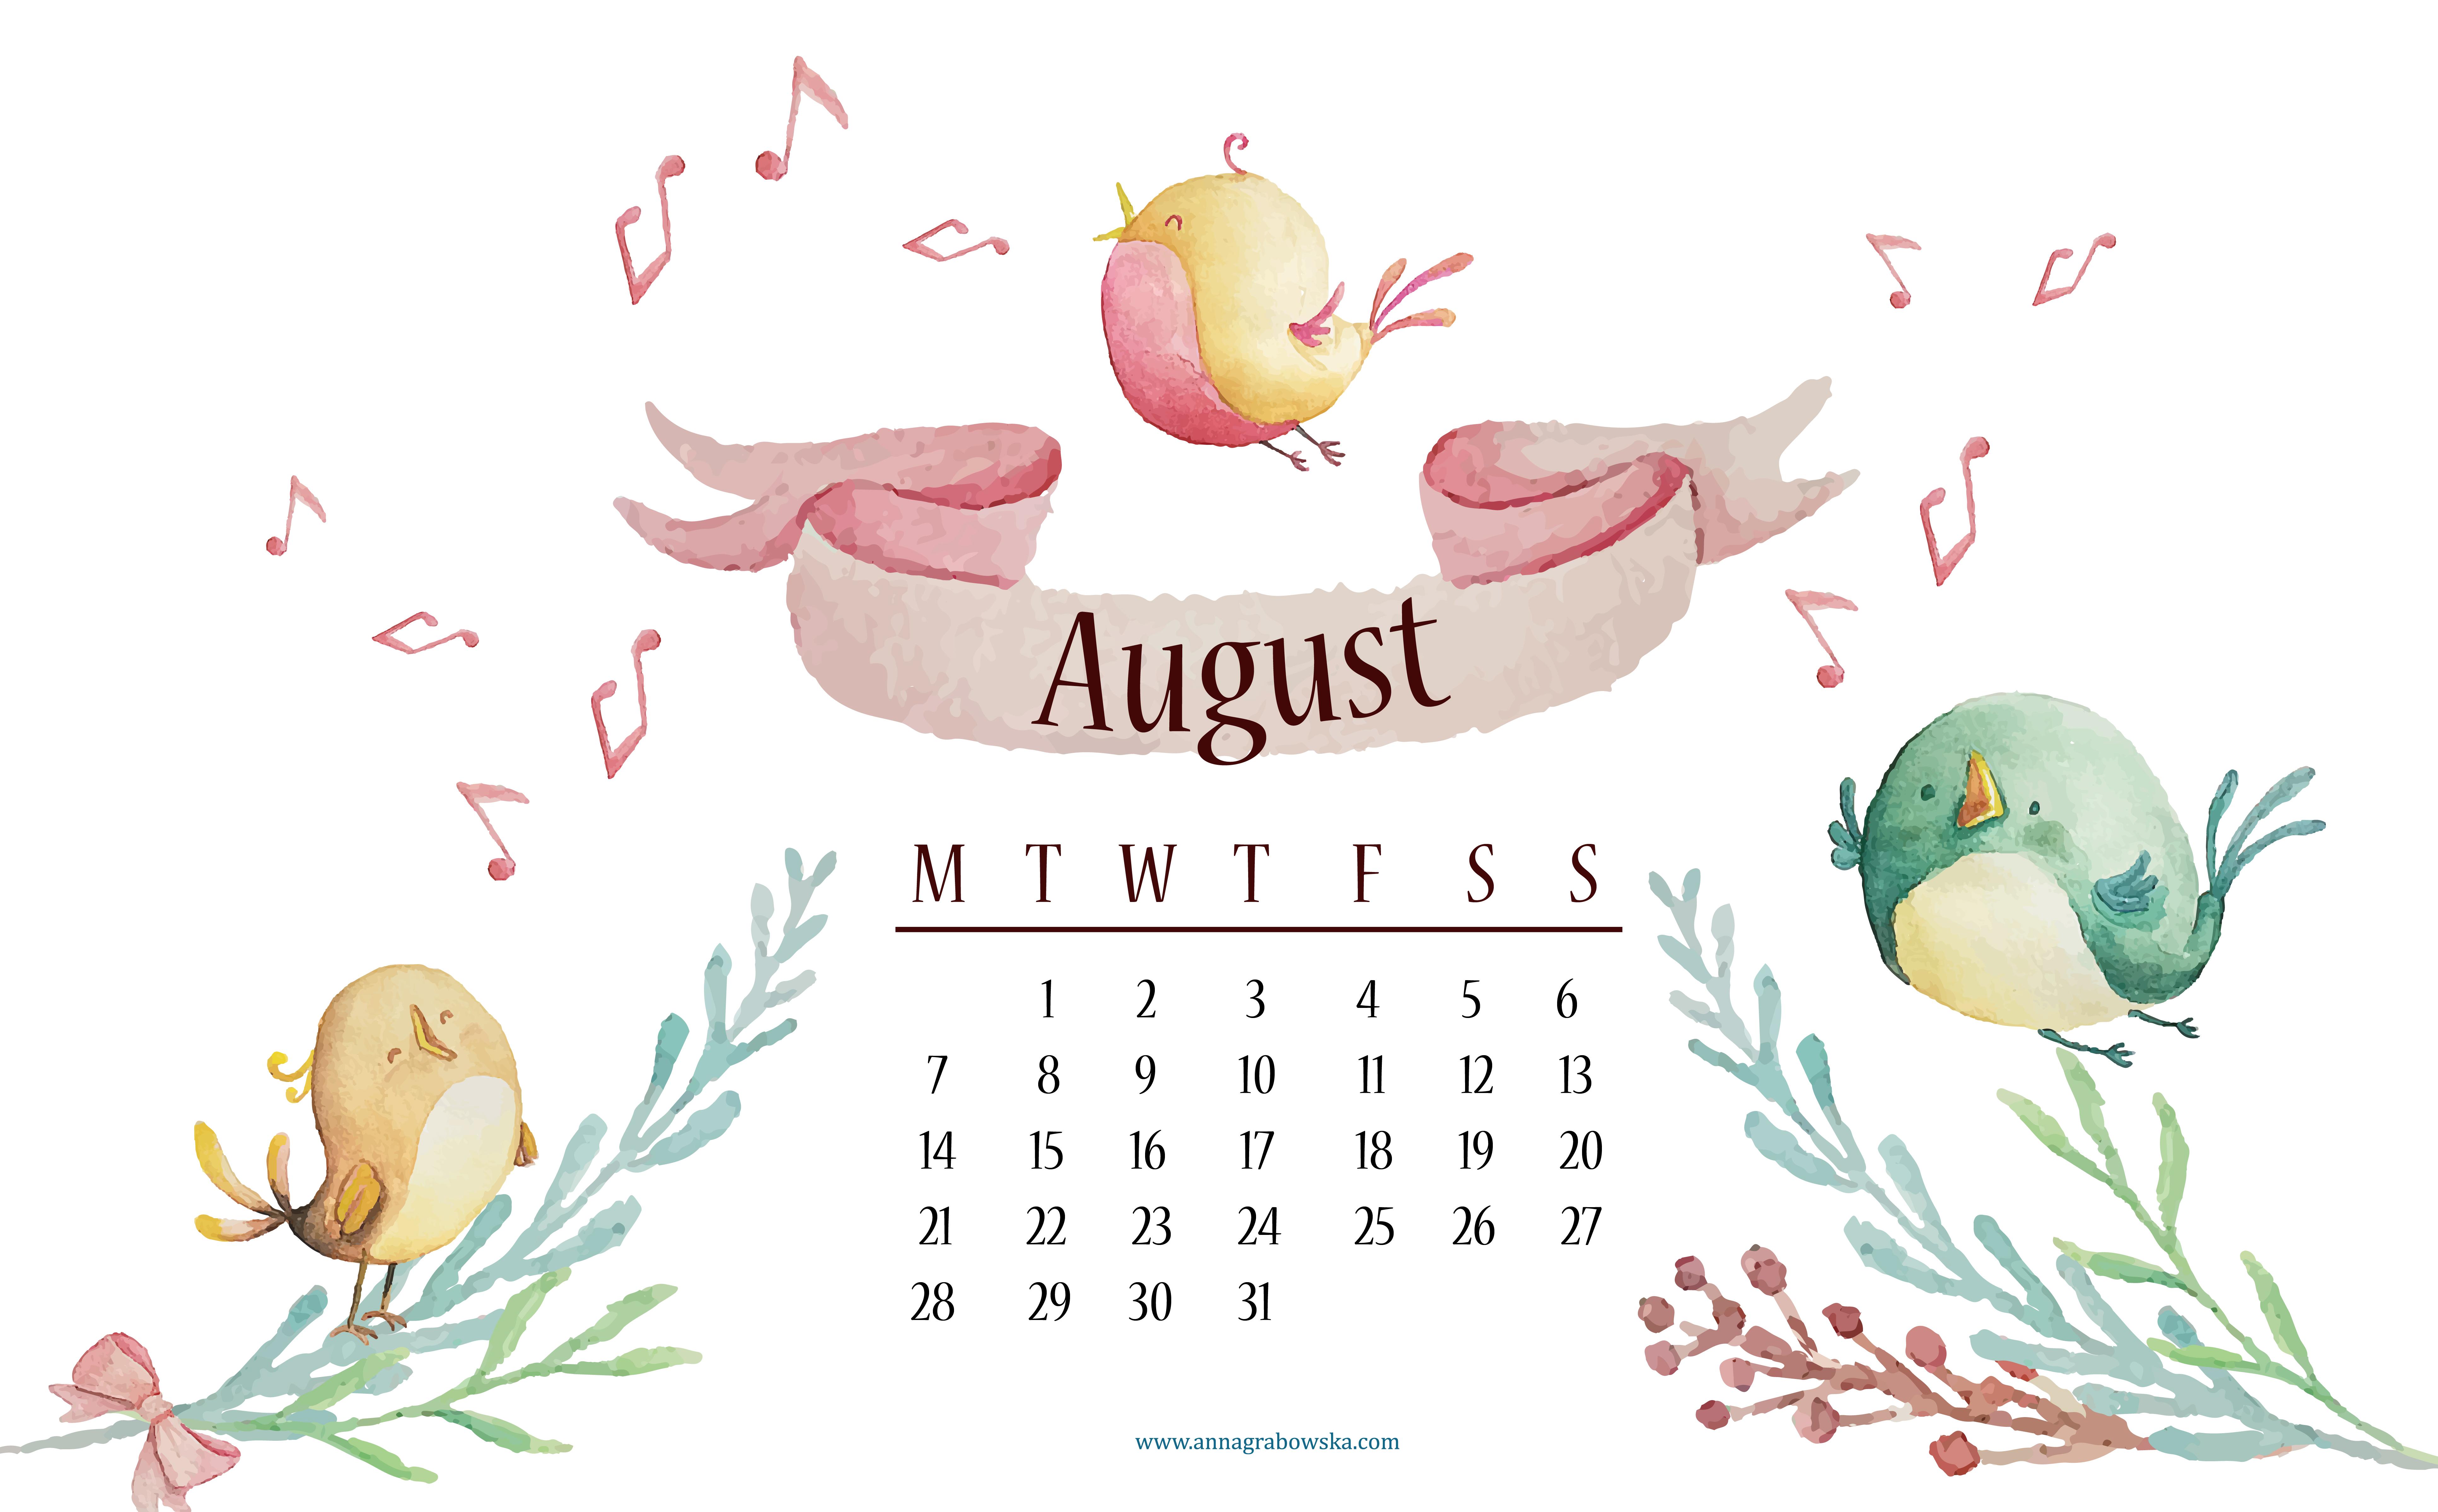 Darmowy kalendarz sierpien